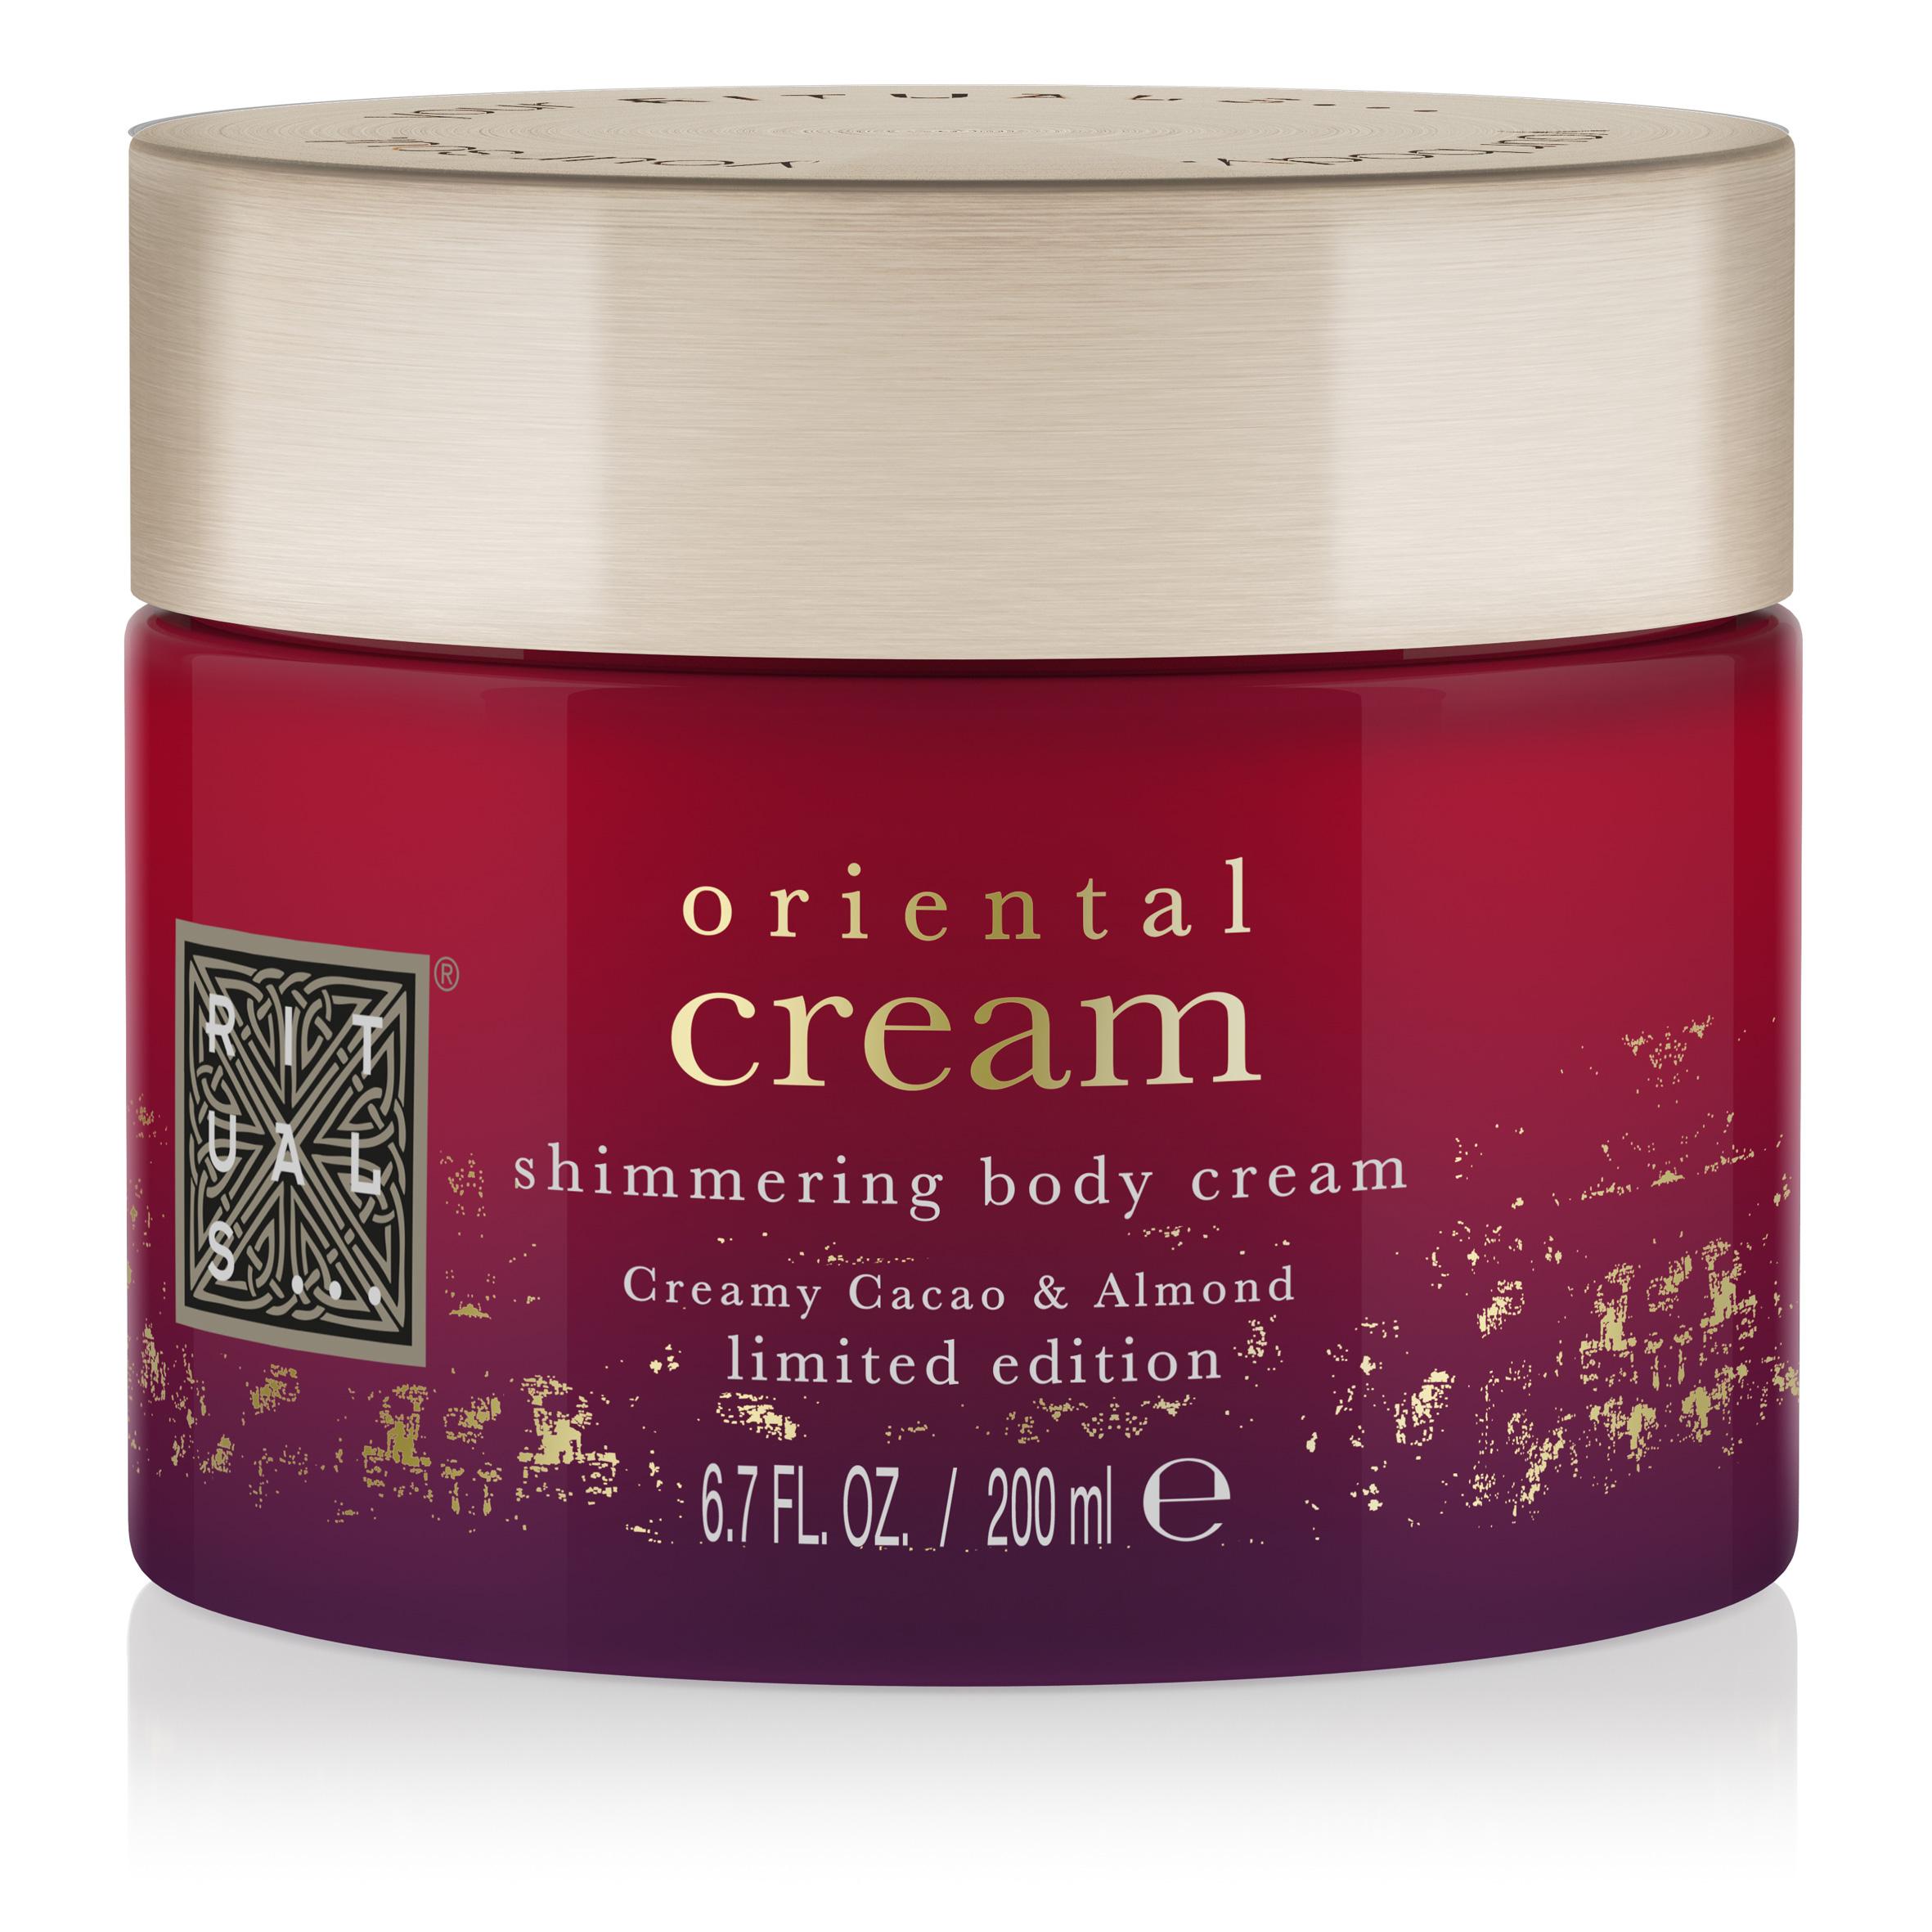 Rituals Oriental Cream